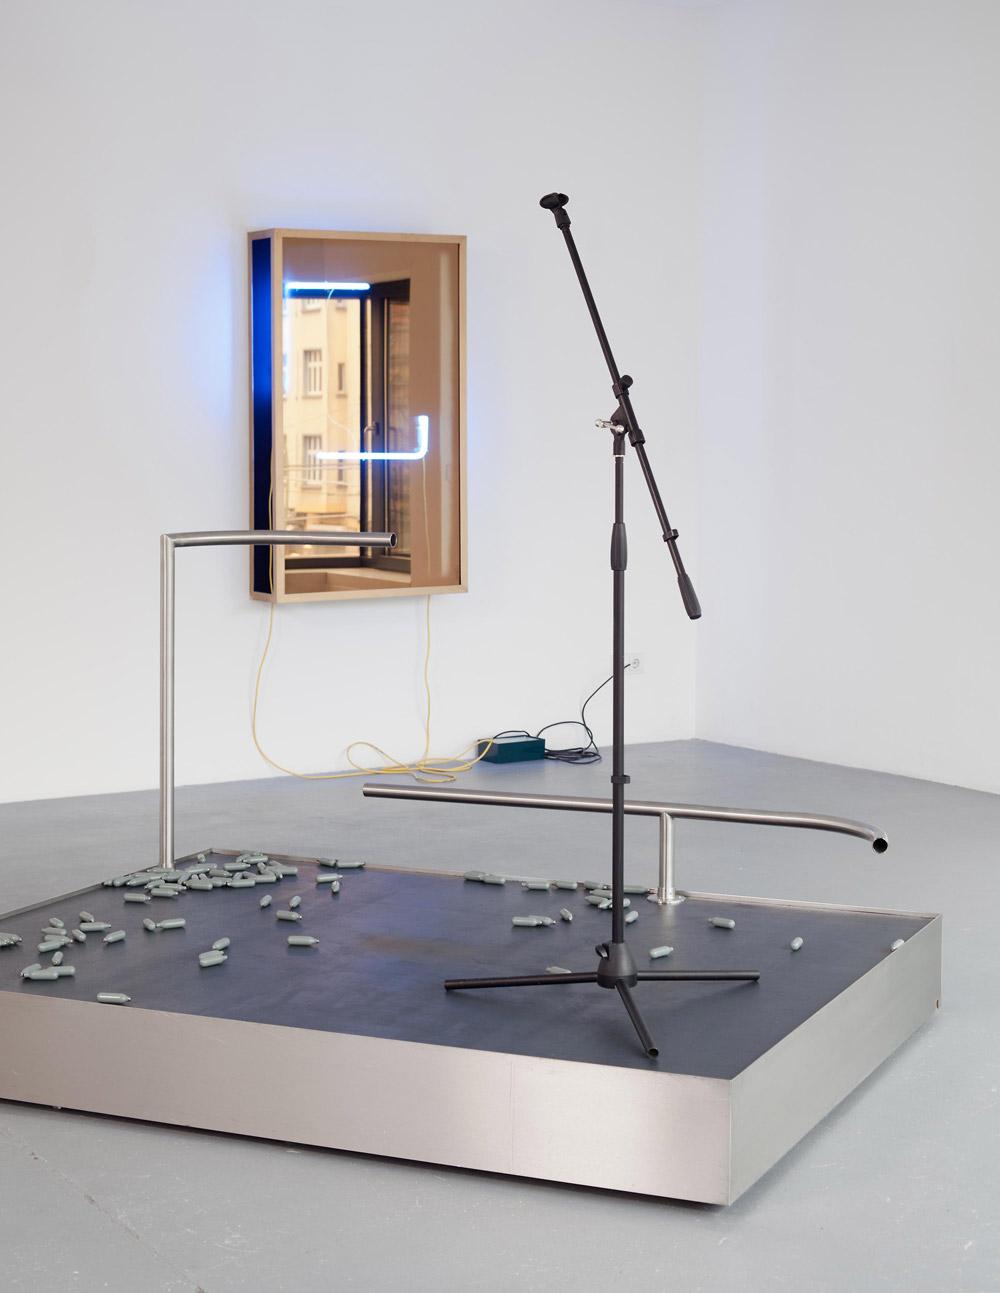 Home – Kunstverein am Rosa–Luxemburg–Platz